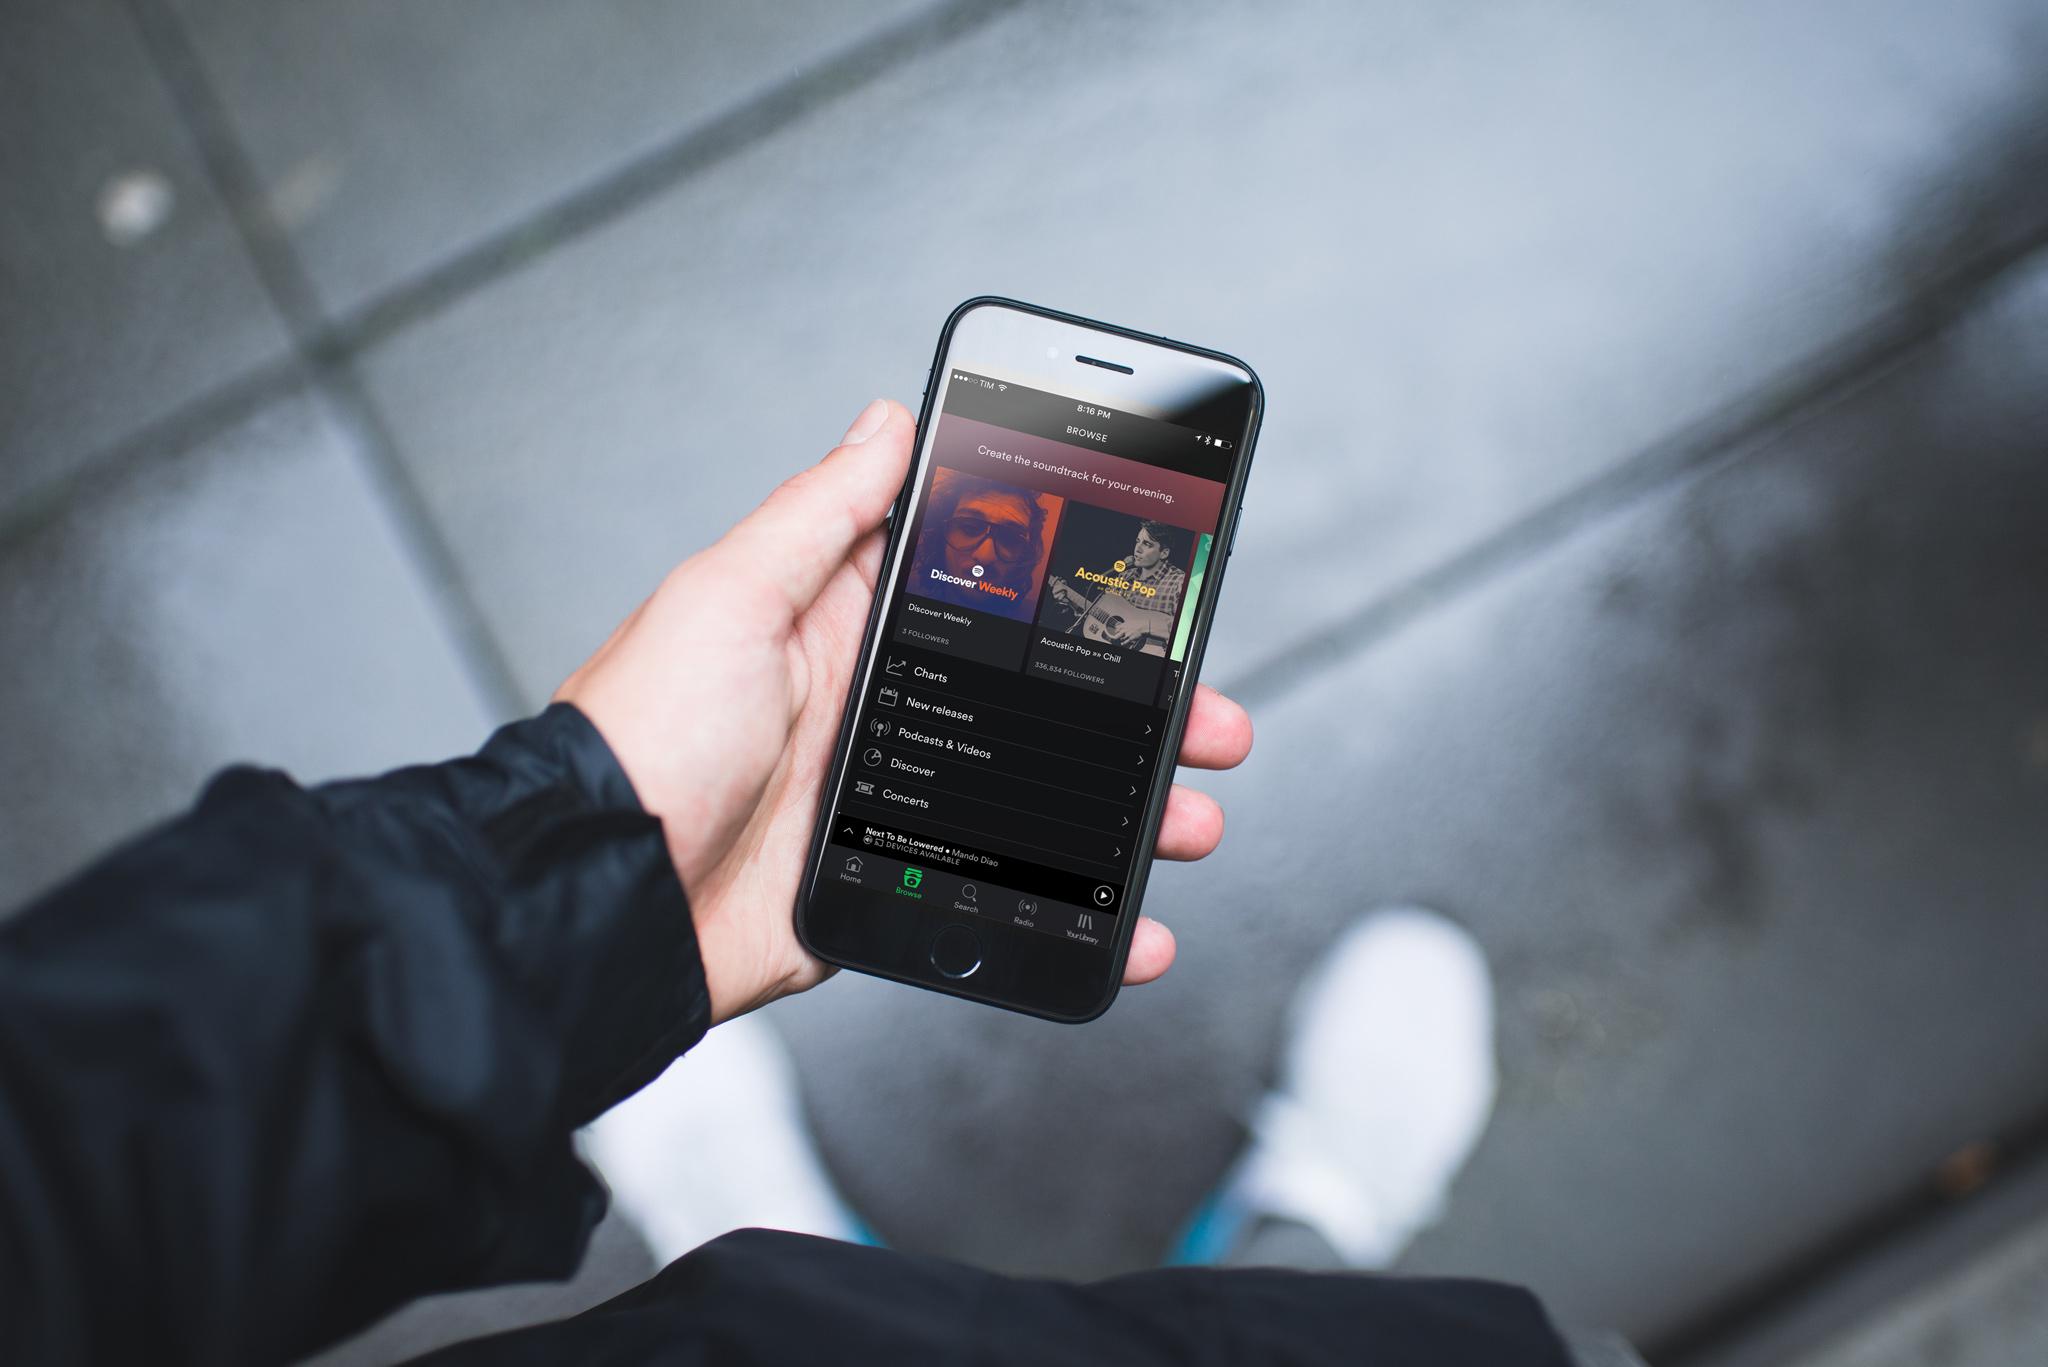 Nach Netflix: Spotify boykottiert Apples In App Purchase System